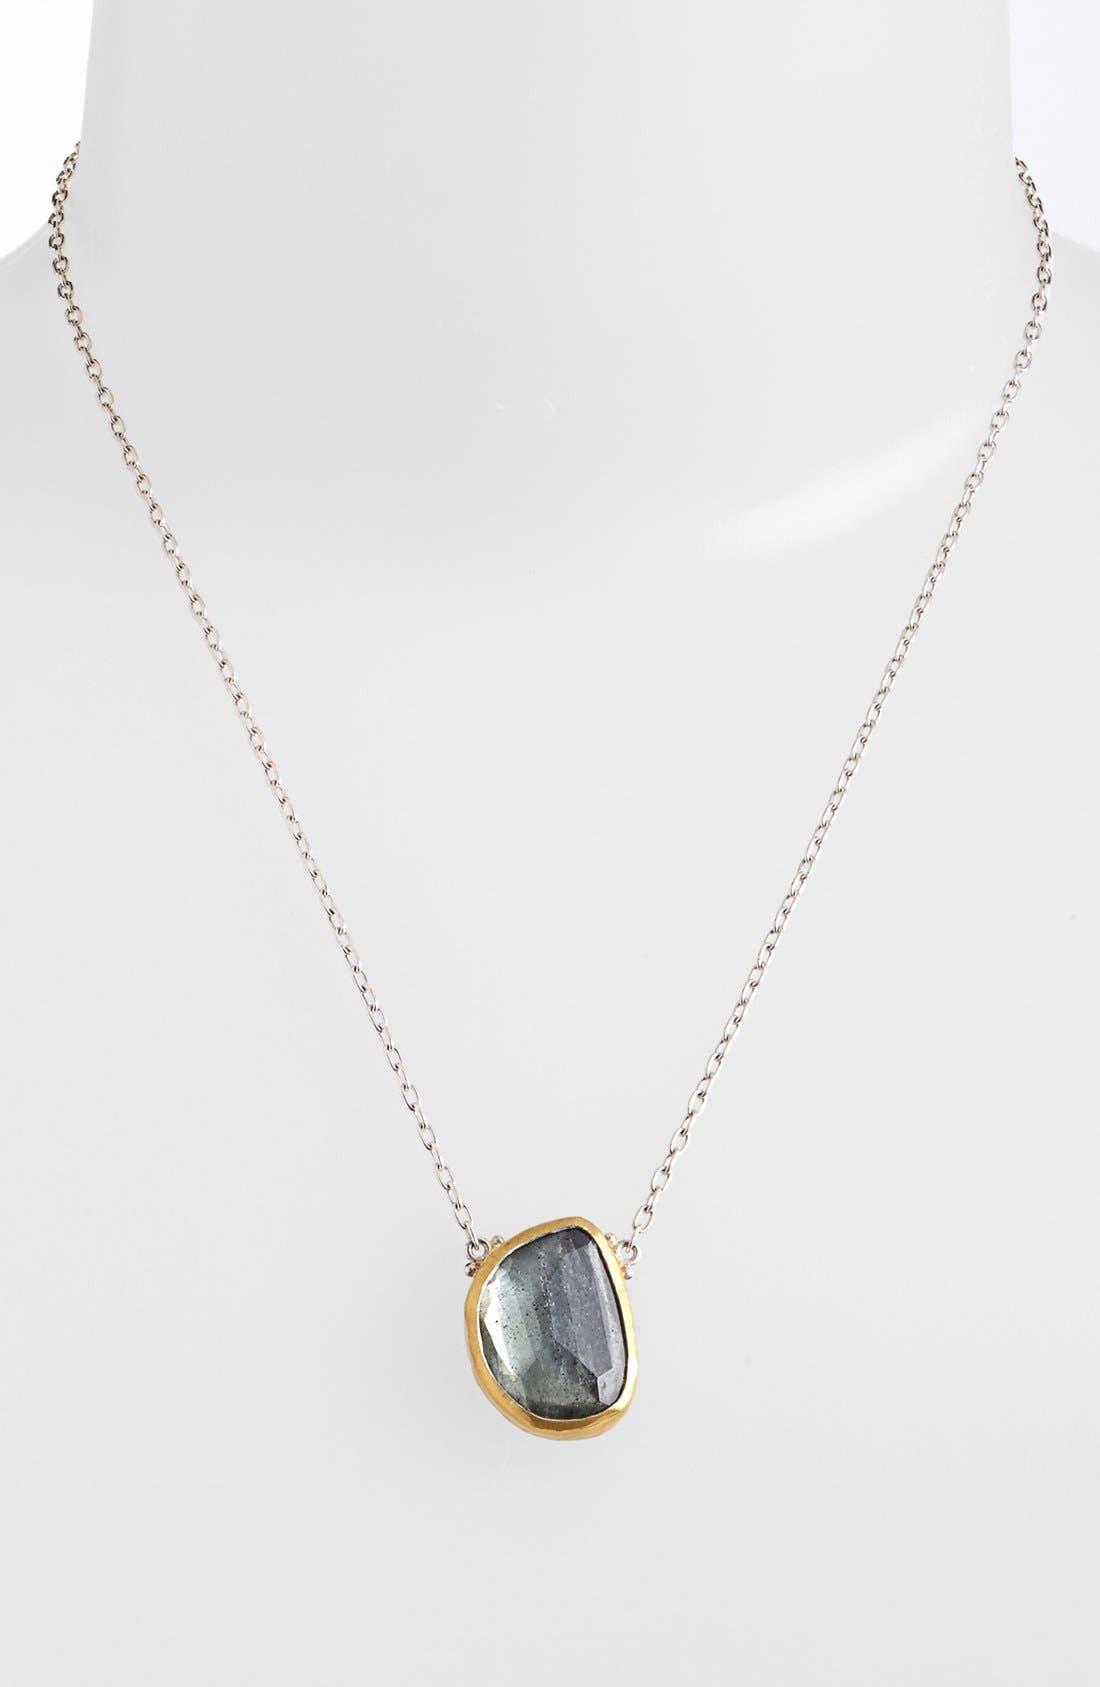 Main Image - Gurhan 'Elements' Moss Aquamarine Pendant Necklace